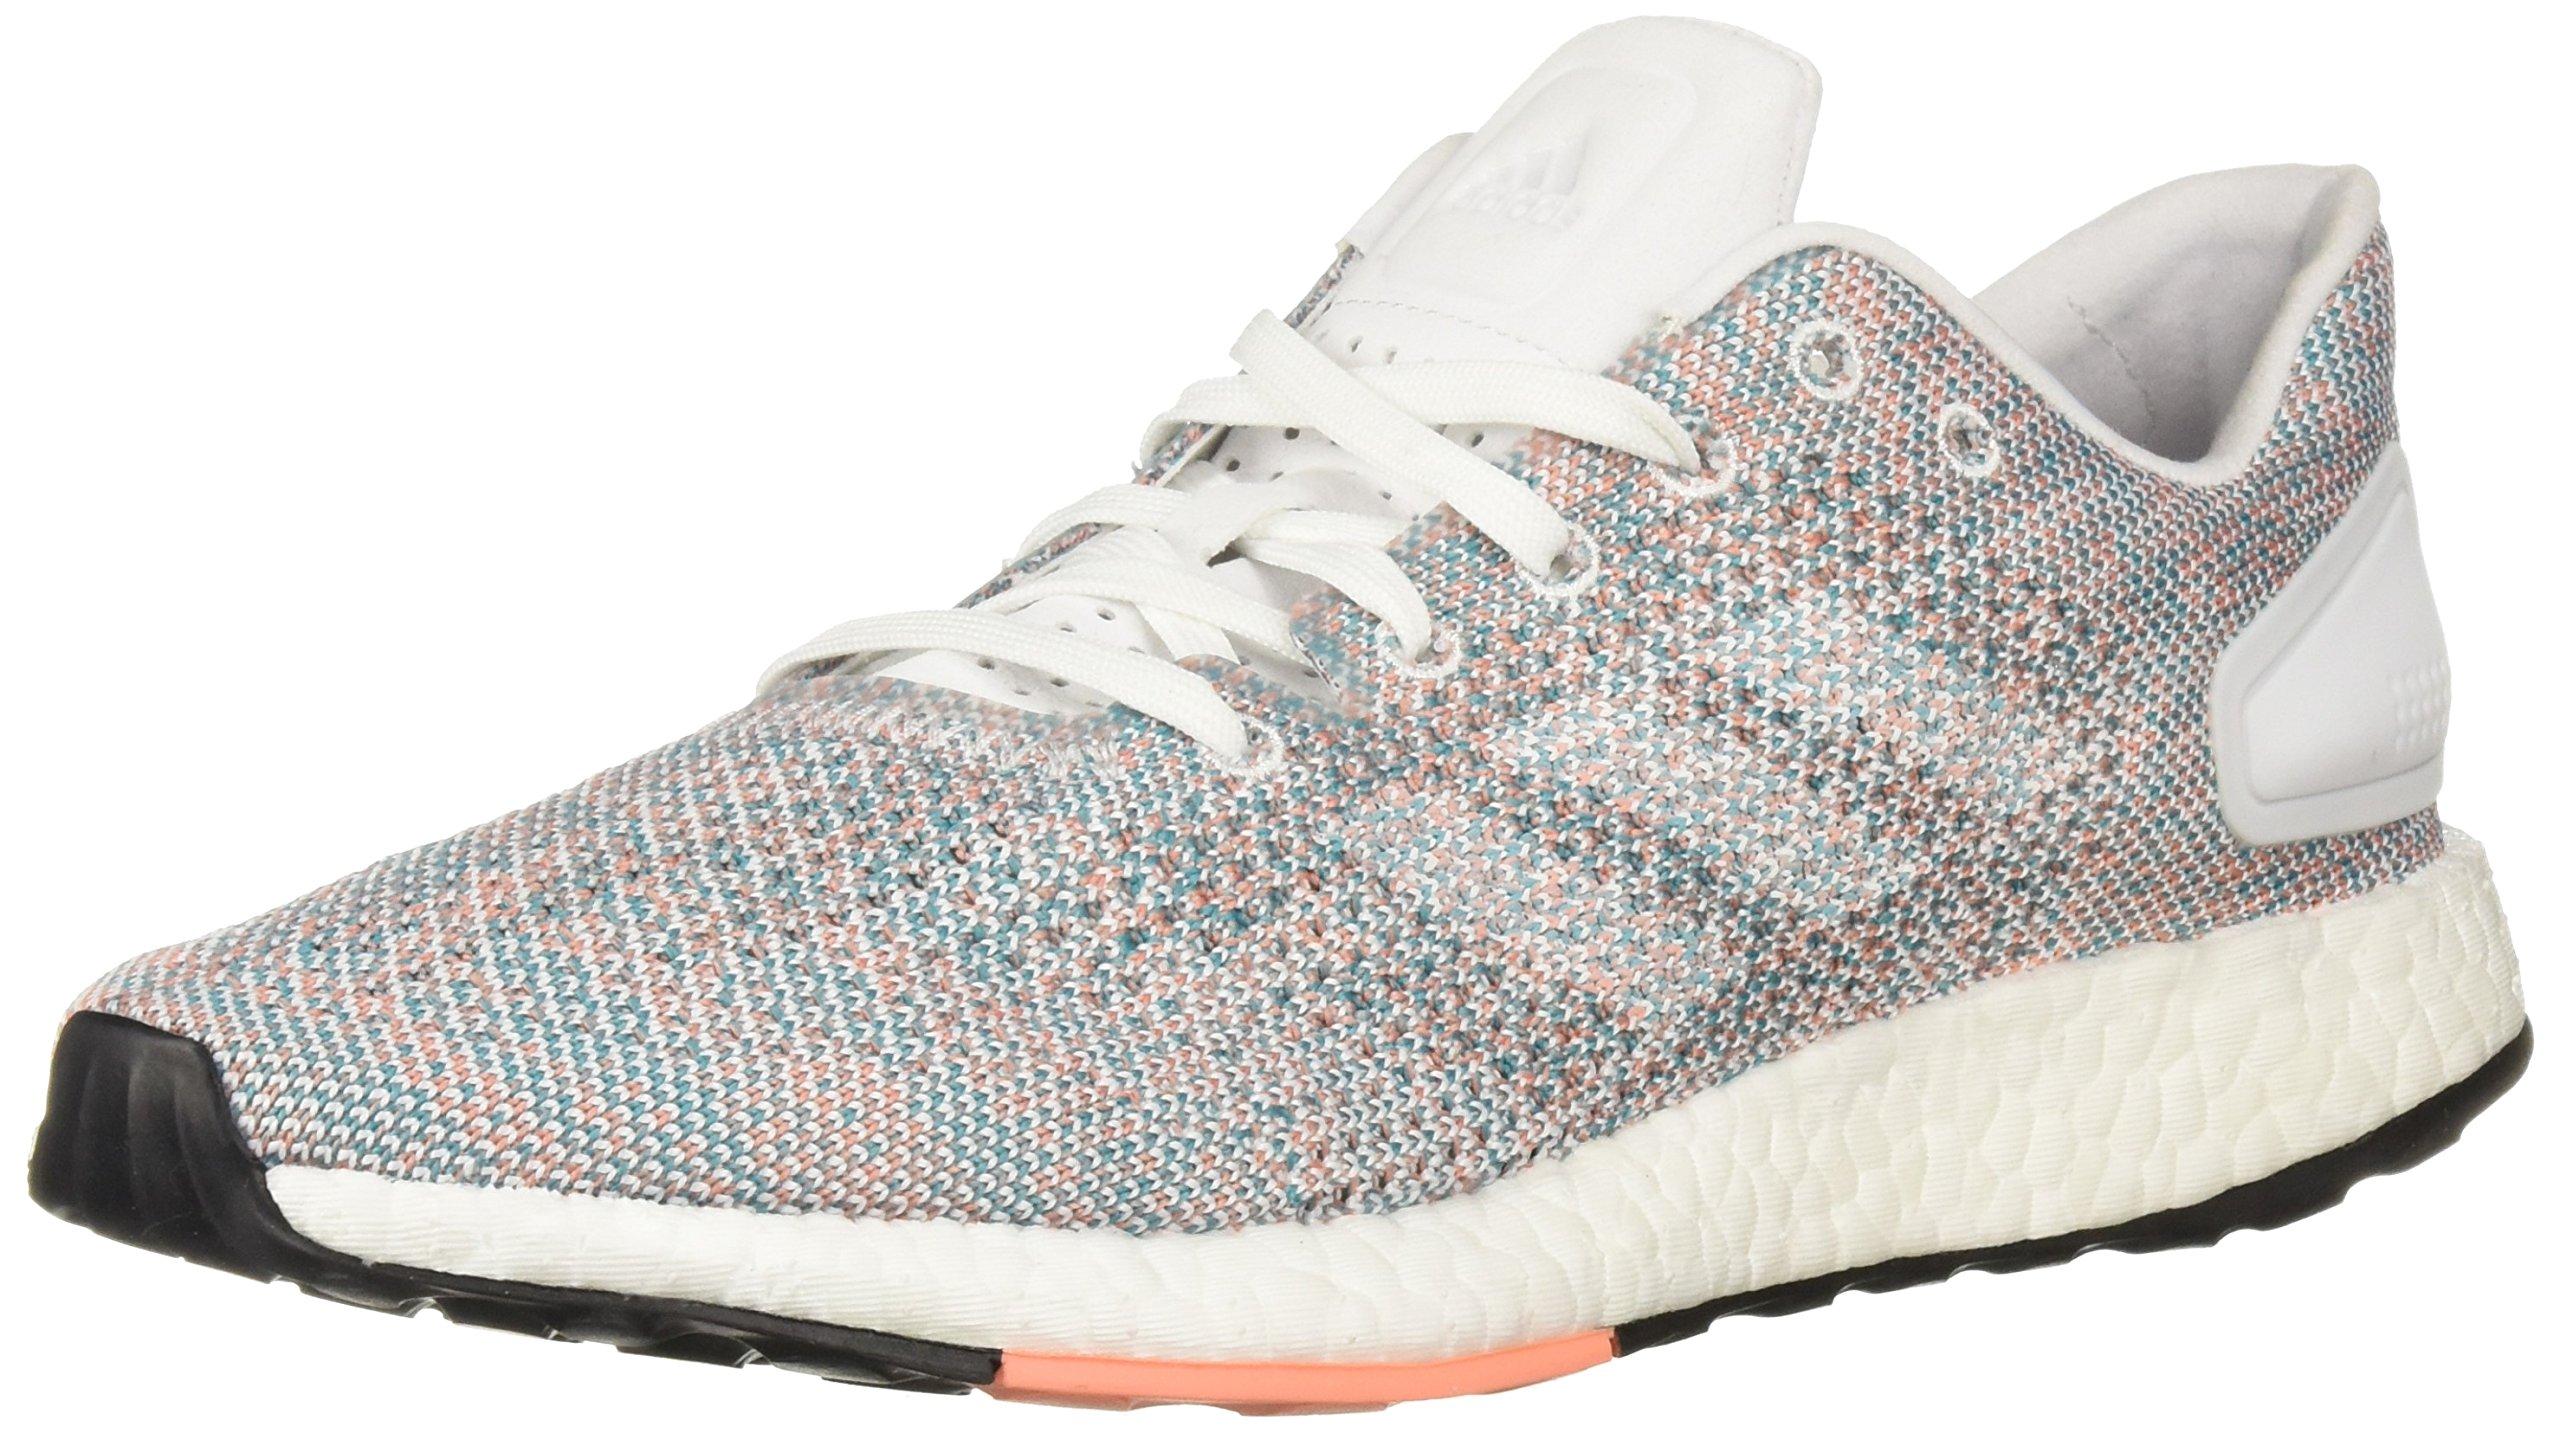 adidas Women's Pureboost DPR Running Shoes, White/Chalk Coral, 5 M US